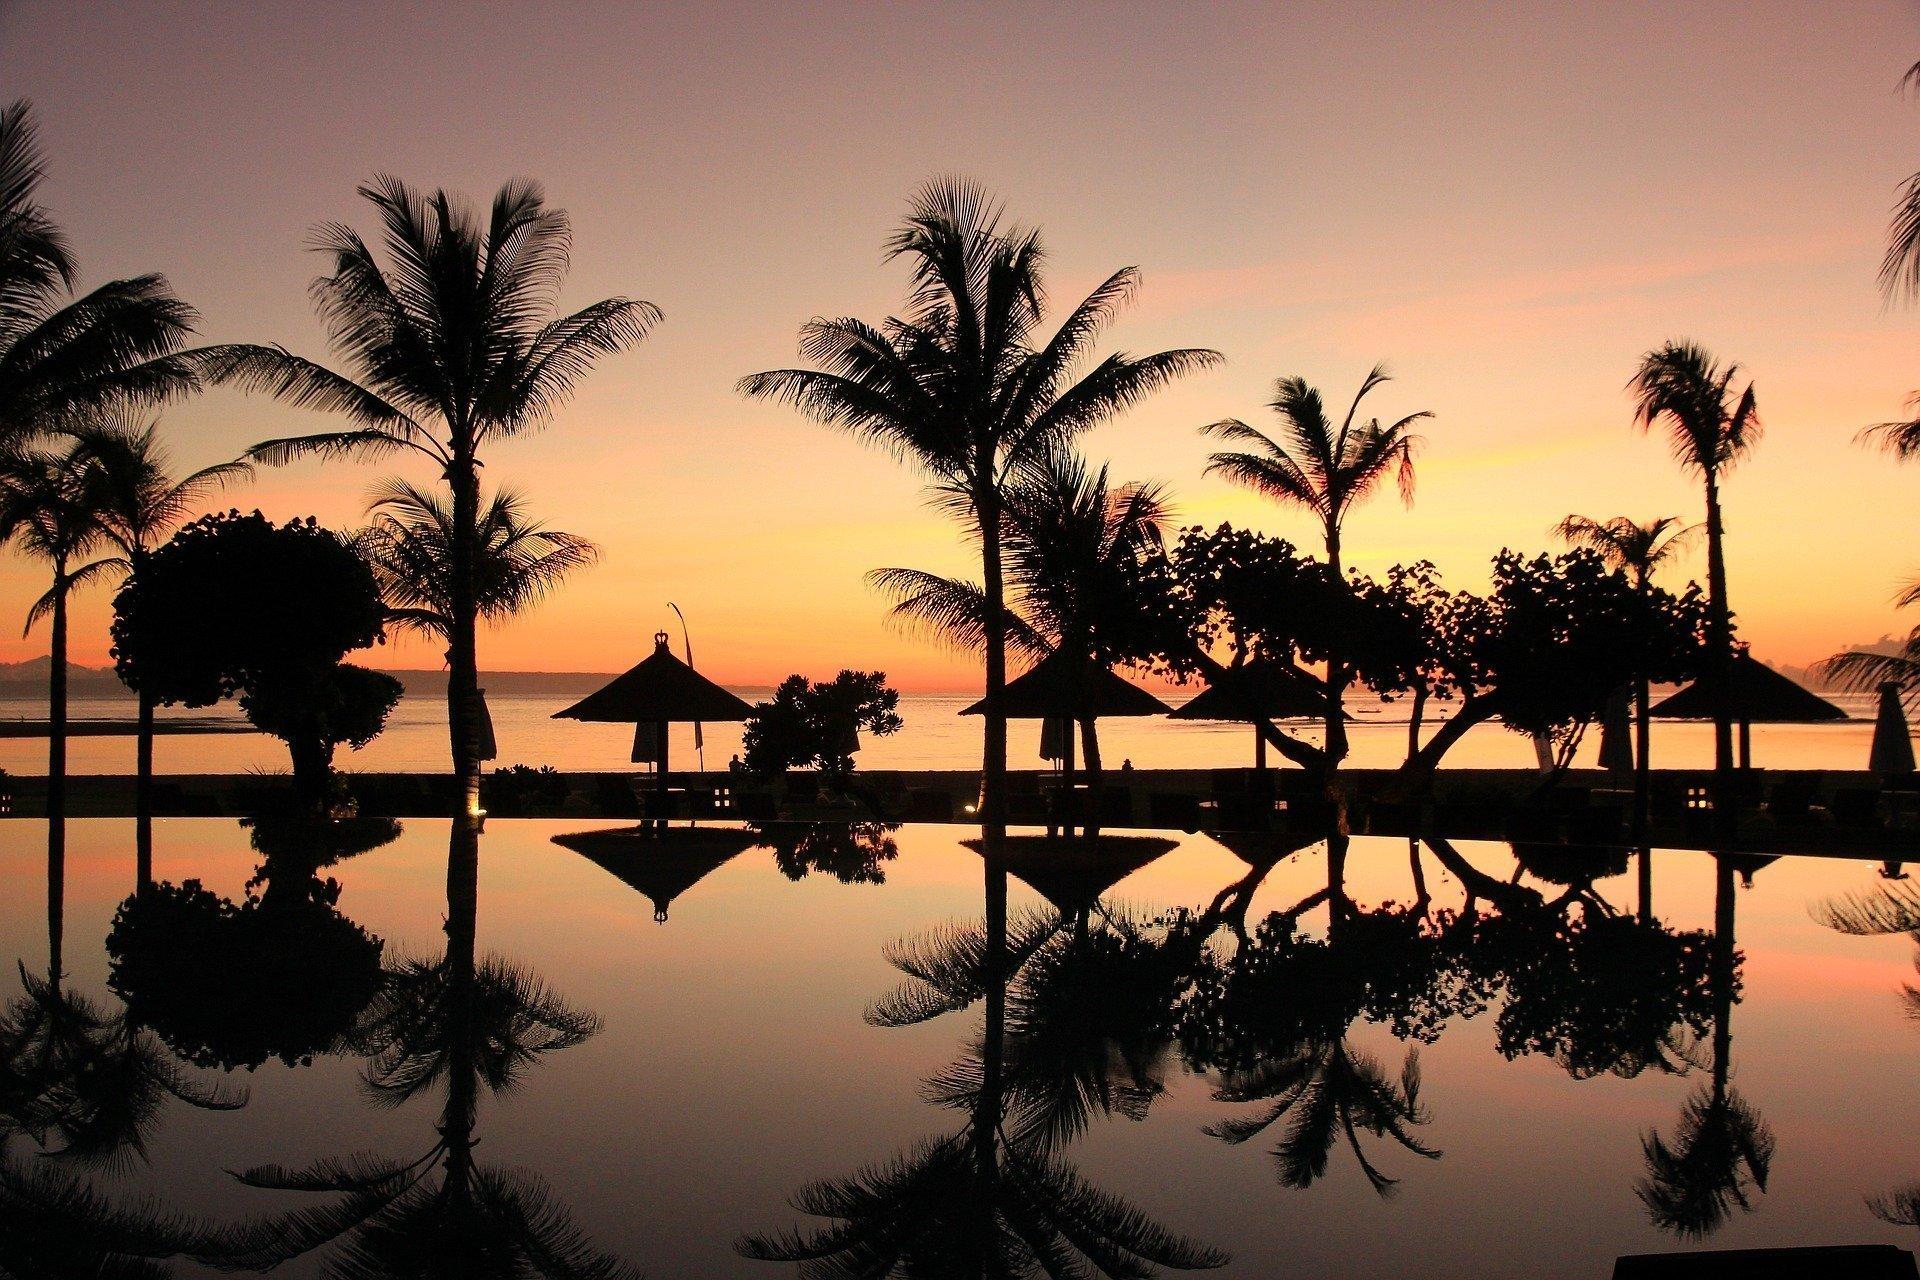 bali 2975787 1920 - Nihi Sumba Island, a dream luxury hotel